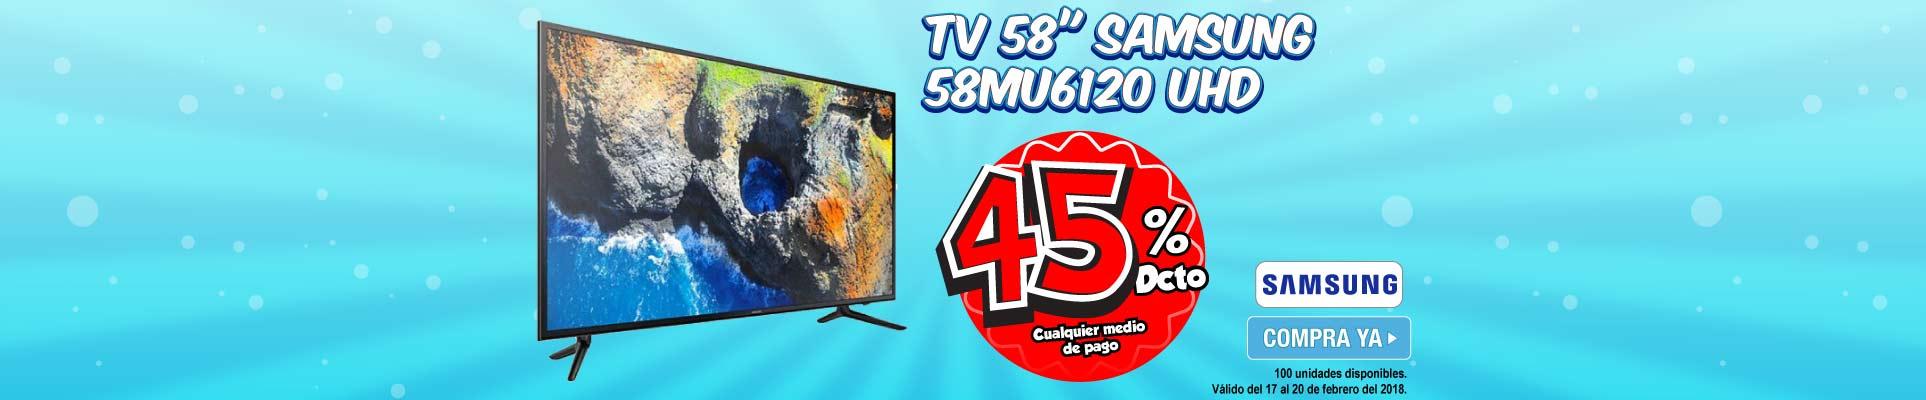 PPAL ALKP-2-TV-TV 58 148cm SAMSUNG 58MU6120 UHD-prod-Febrero17-20